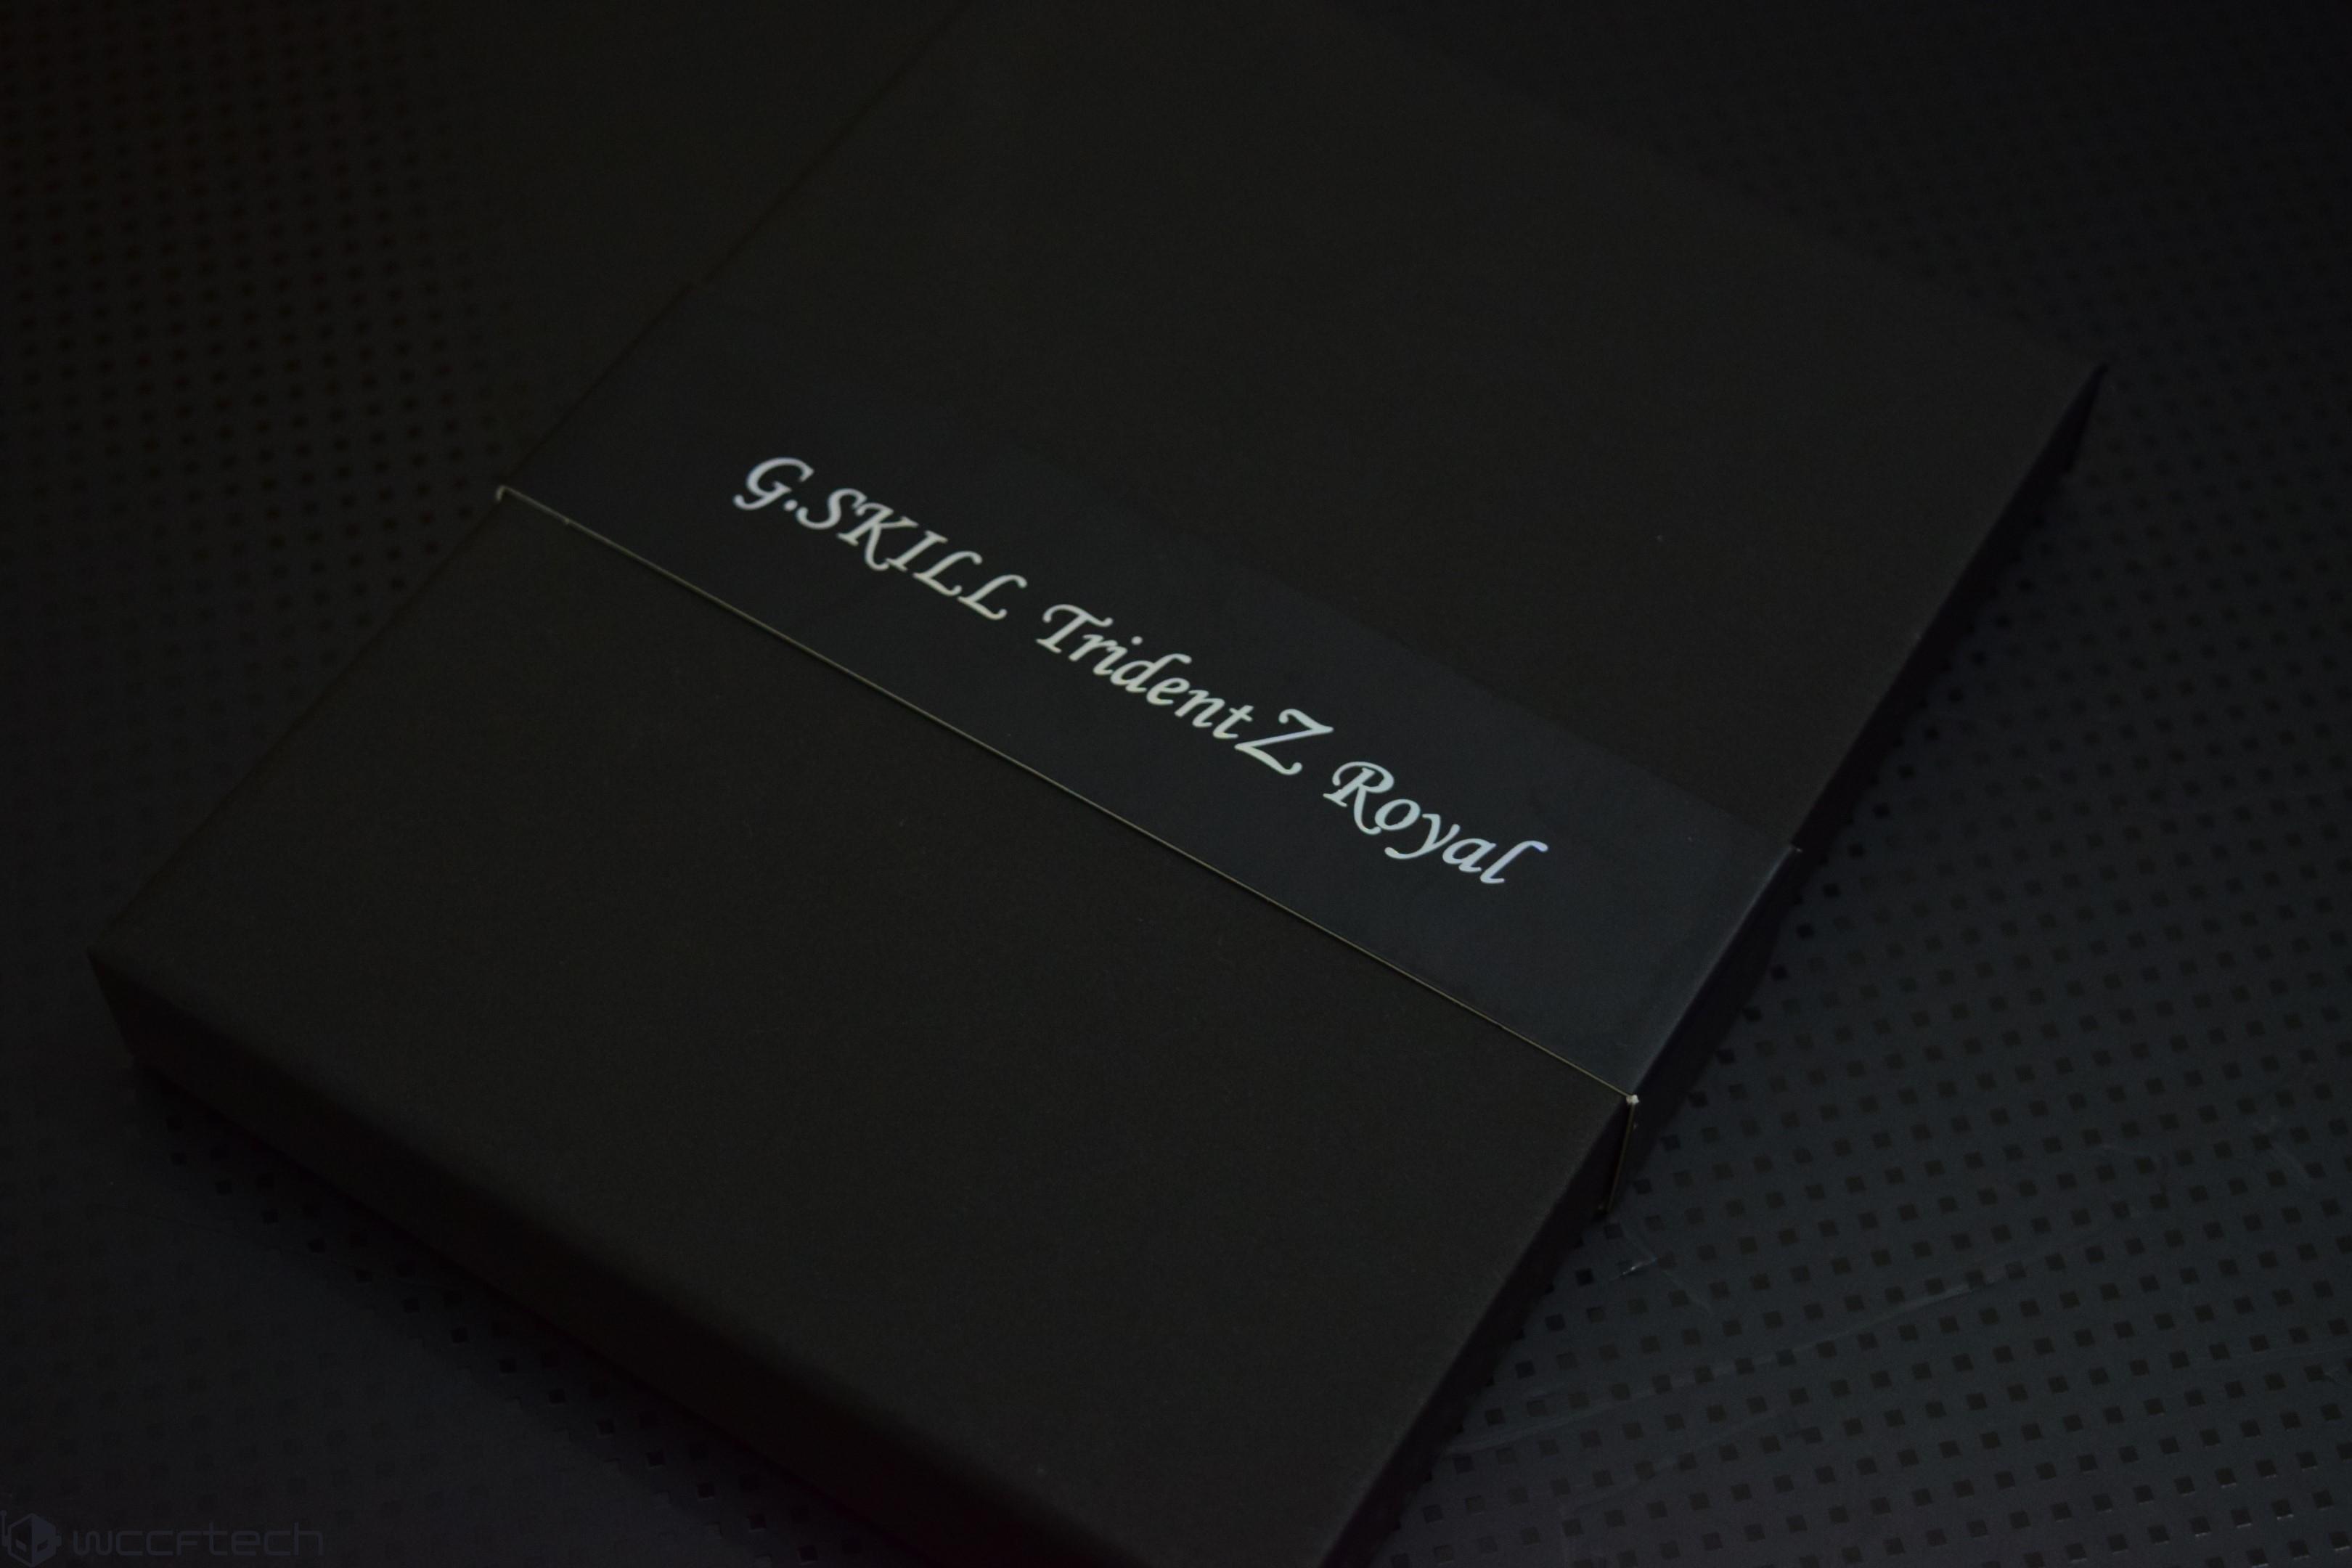 G Skill Trident Z Royal RGB 16 GB DDR4 4000 MHz Memory Kit